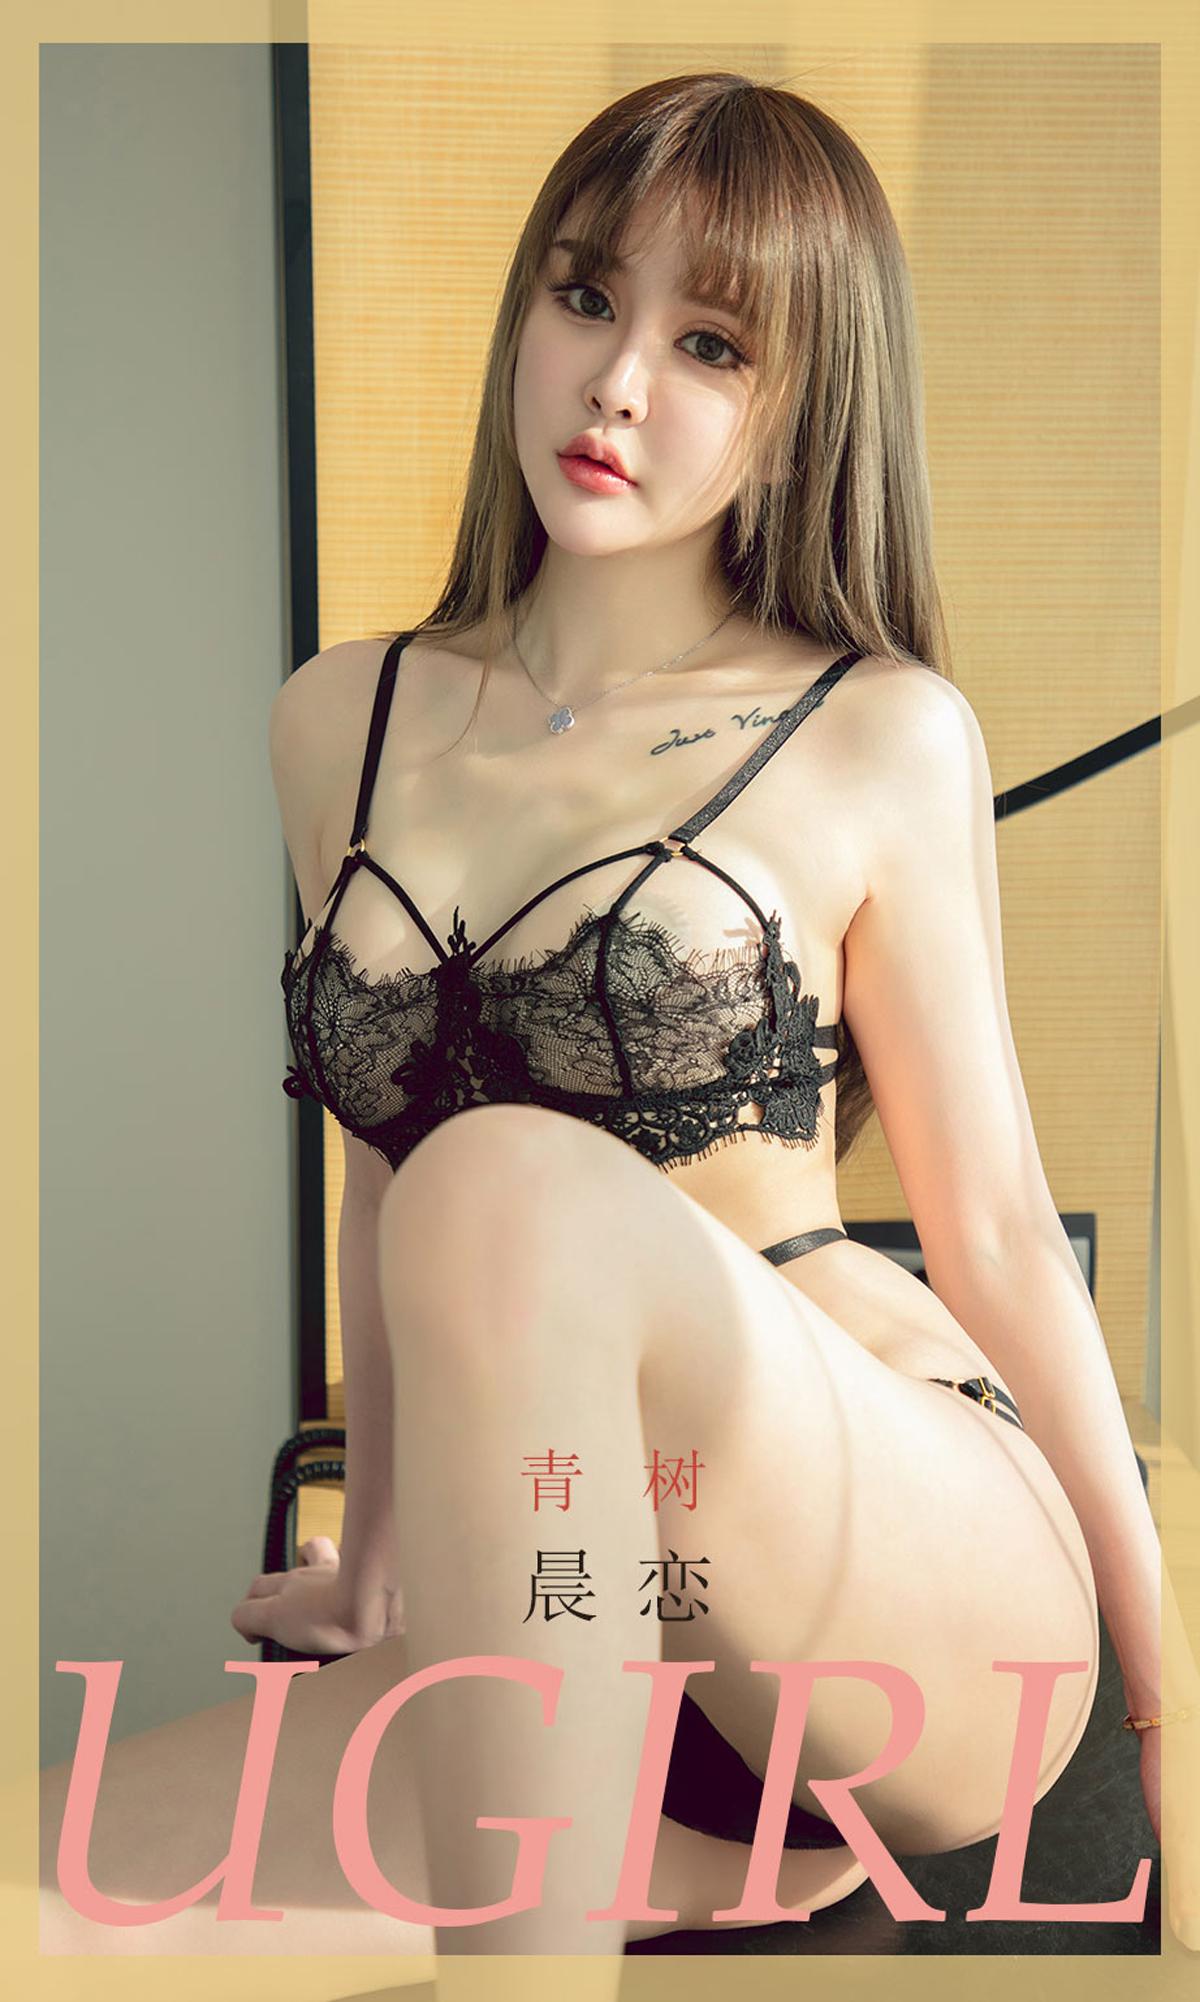 [Ugirls尤果网] 爱尤物专辑 2020.03.08 No.1753 晨恋 青树[/32MB]